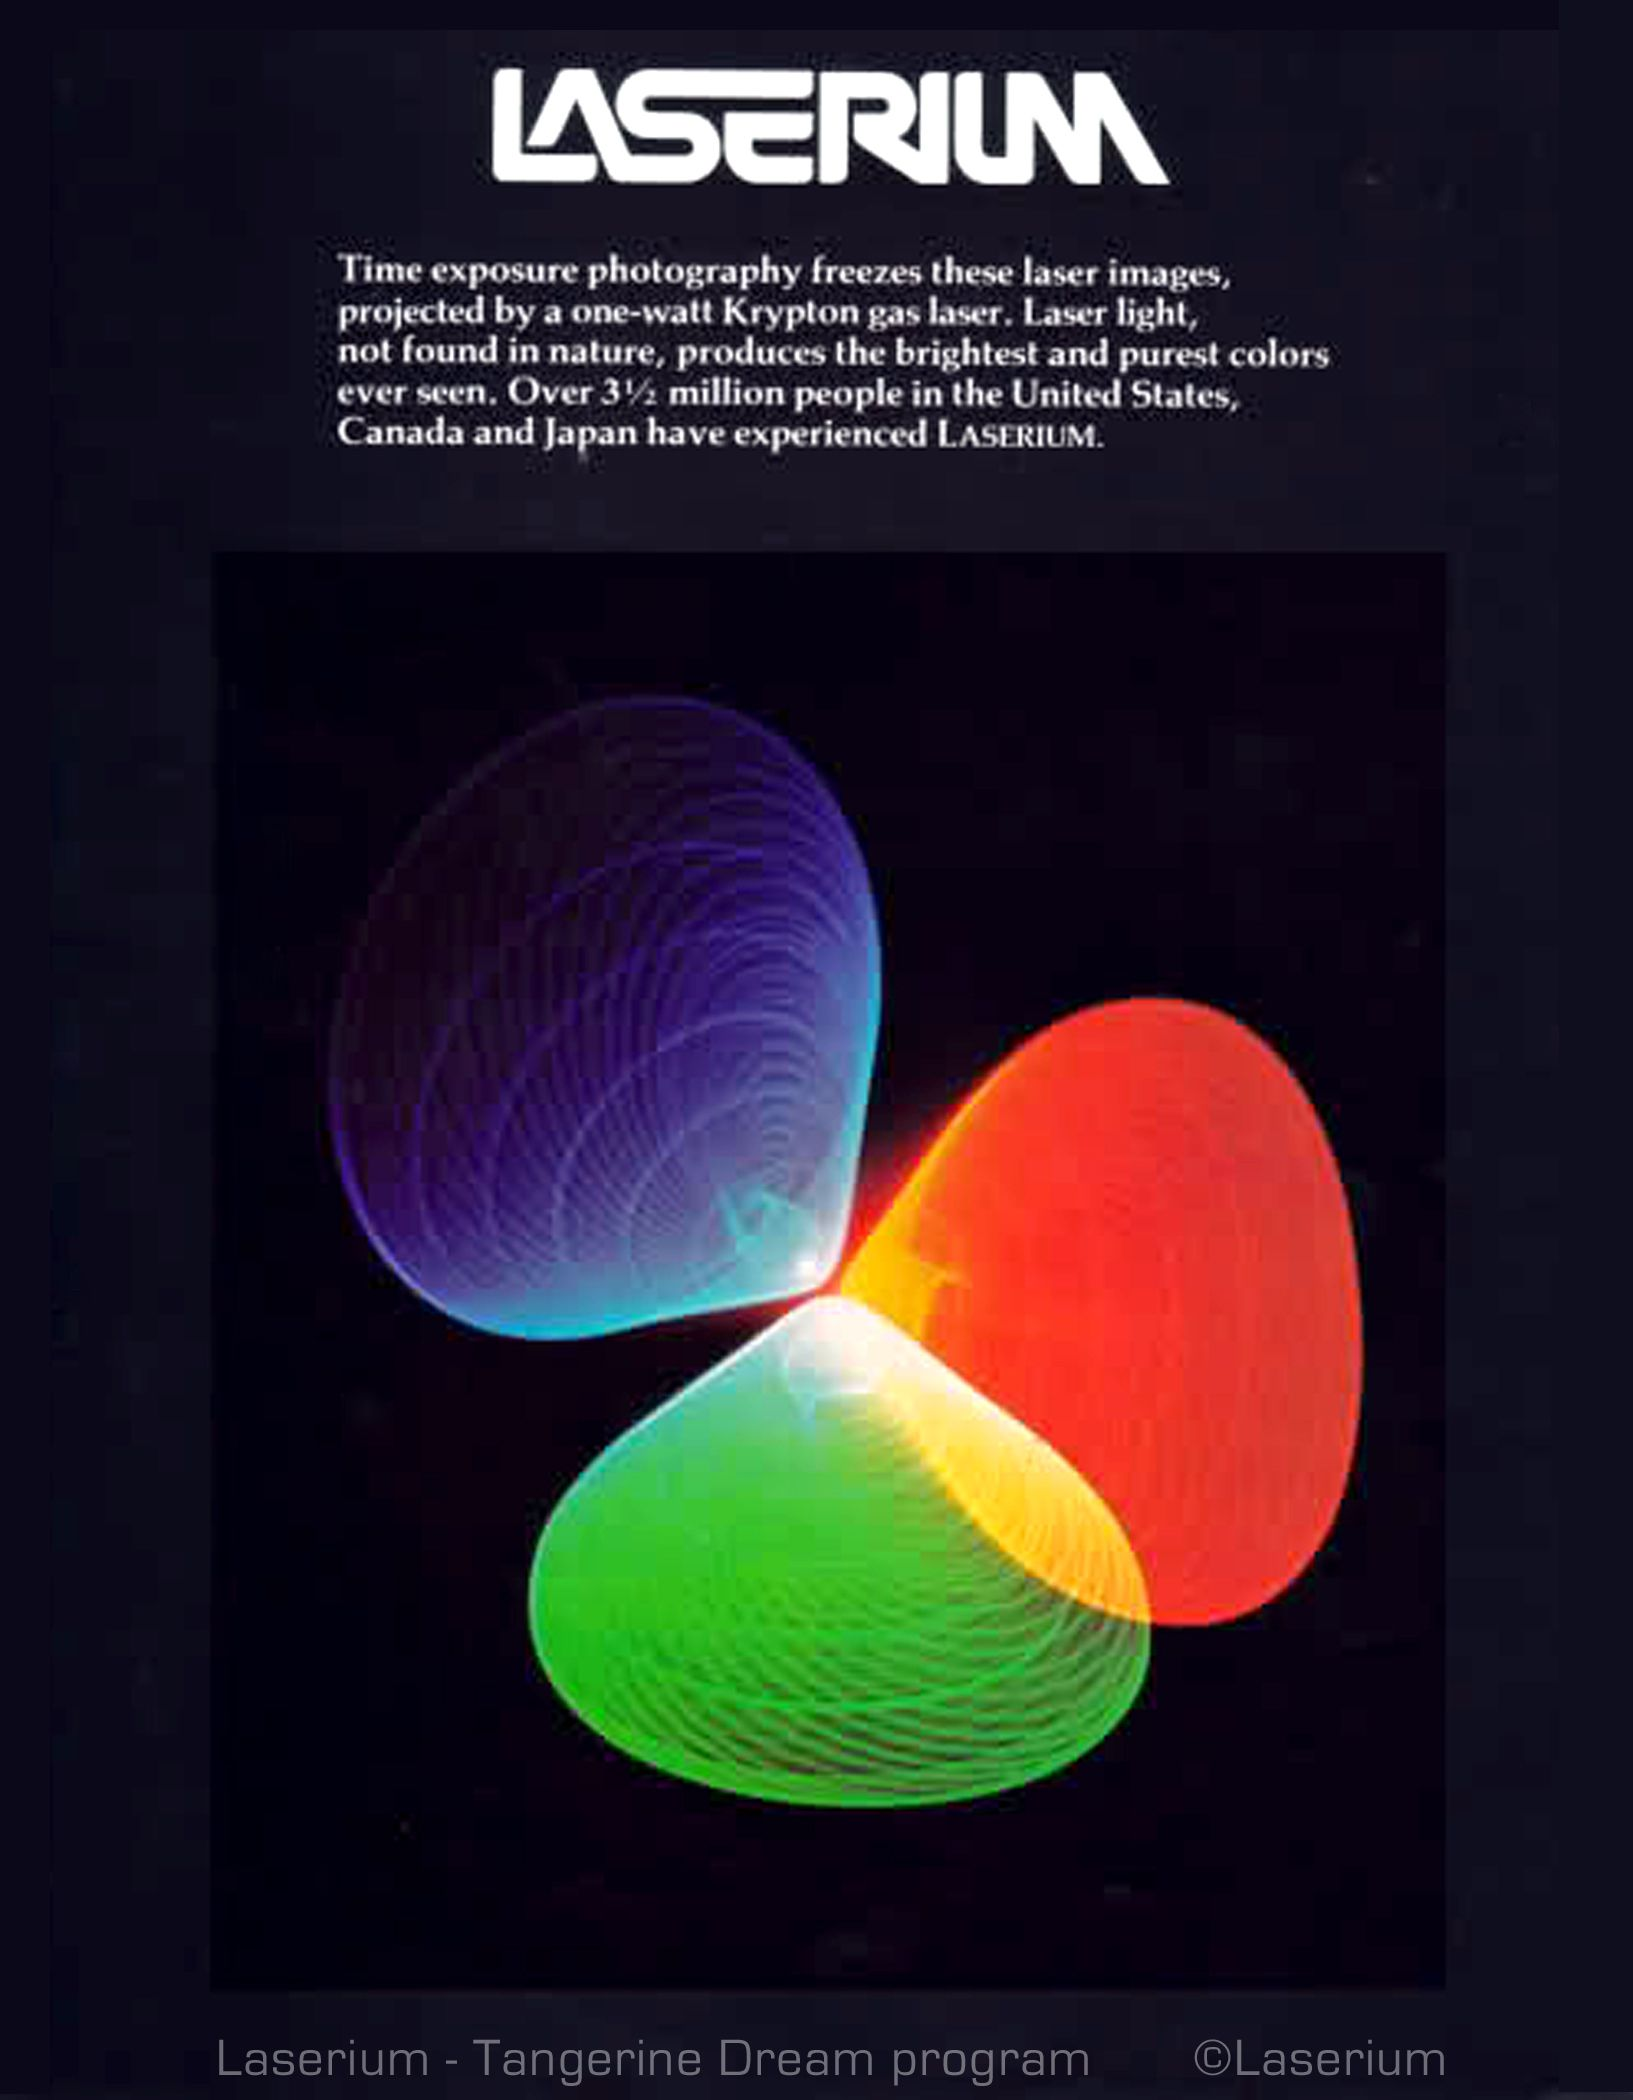 TANGERINE DREAM LASERIUM laser entertainment from tours of